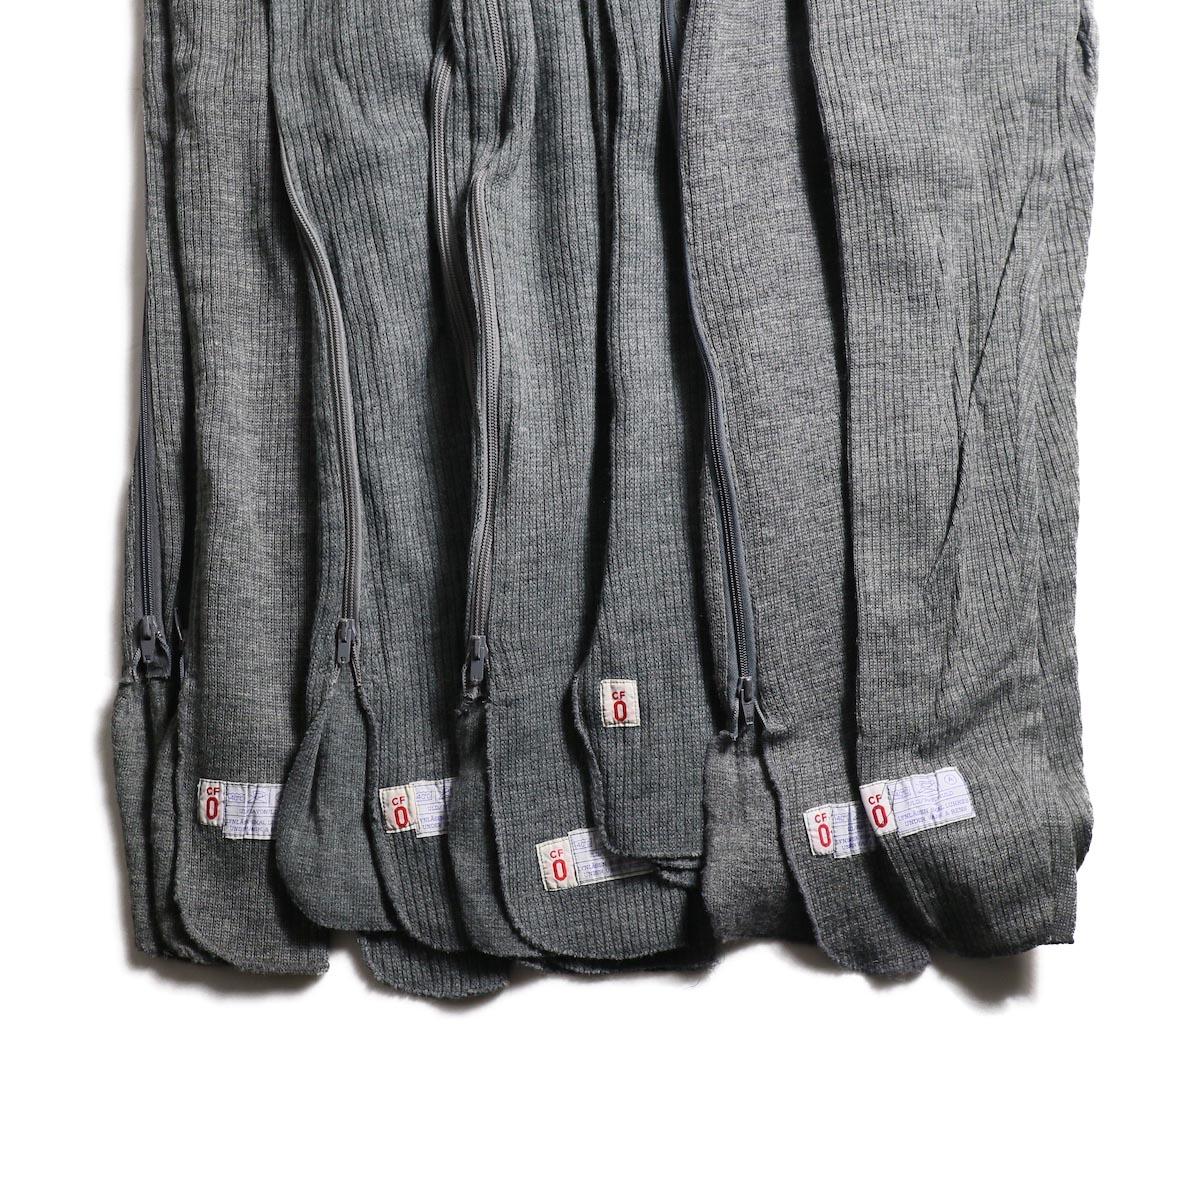 Denmark Military / Side Zip Under Pants (Medium)